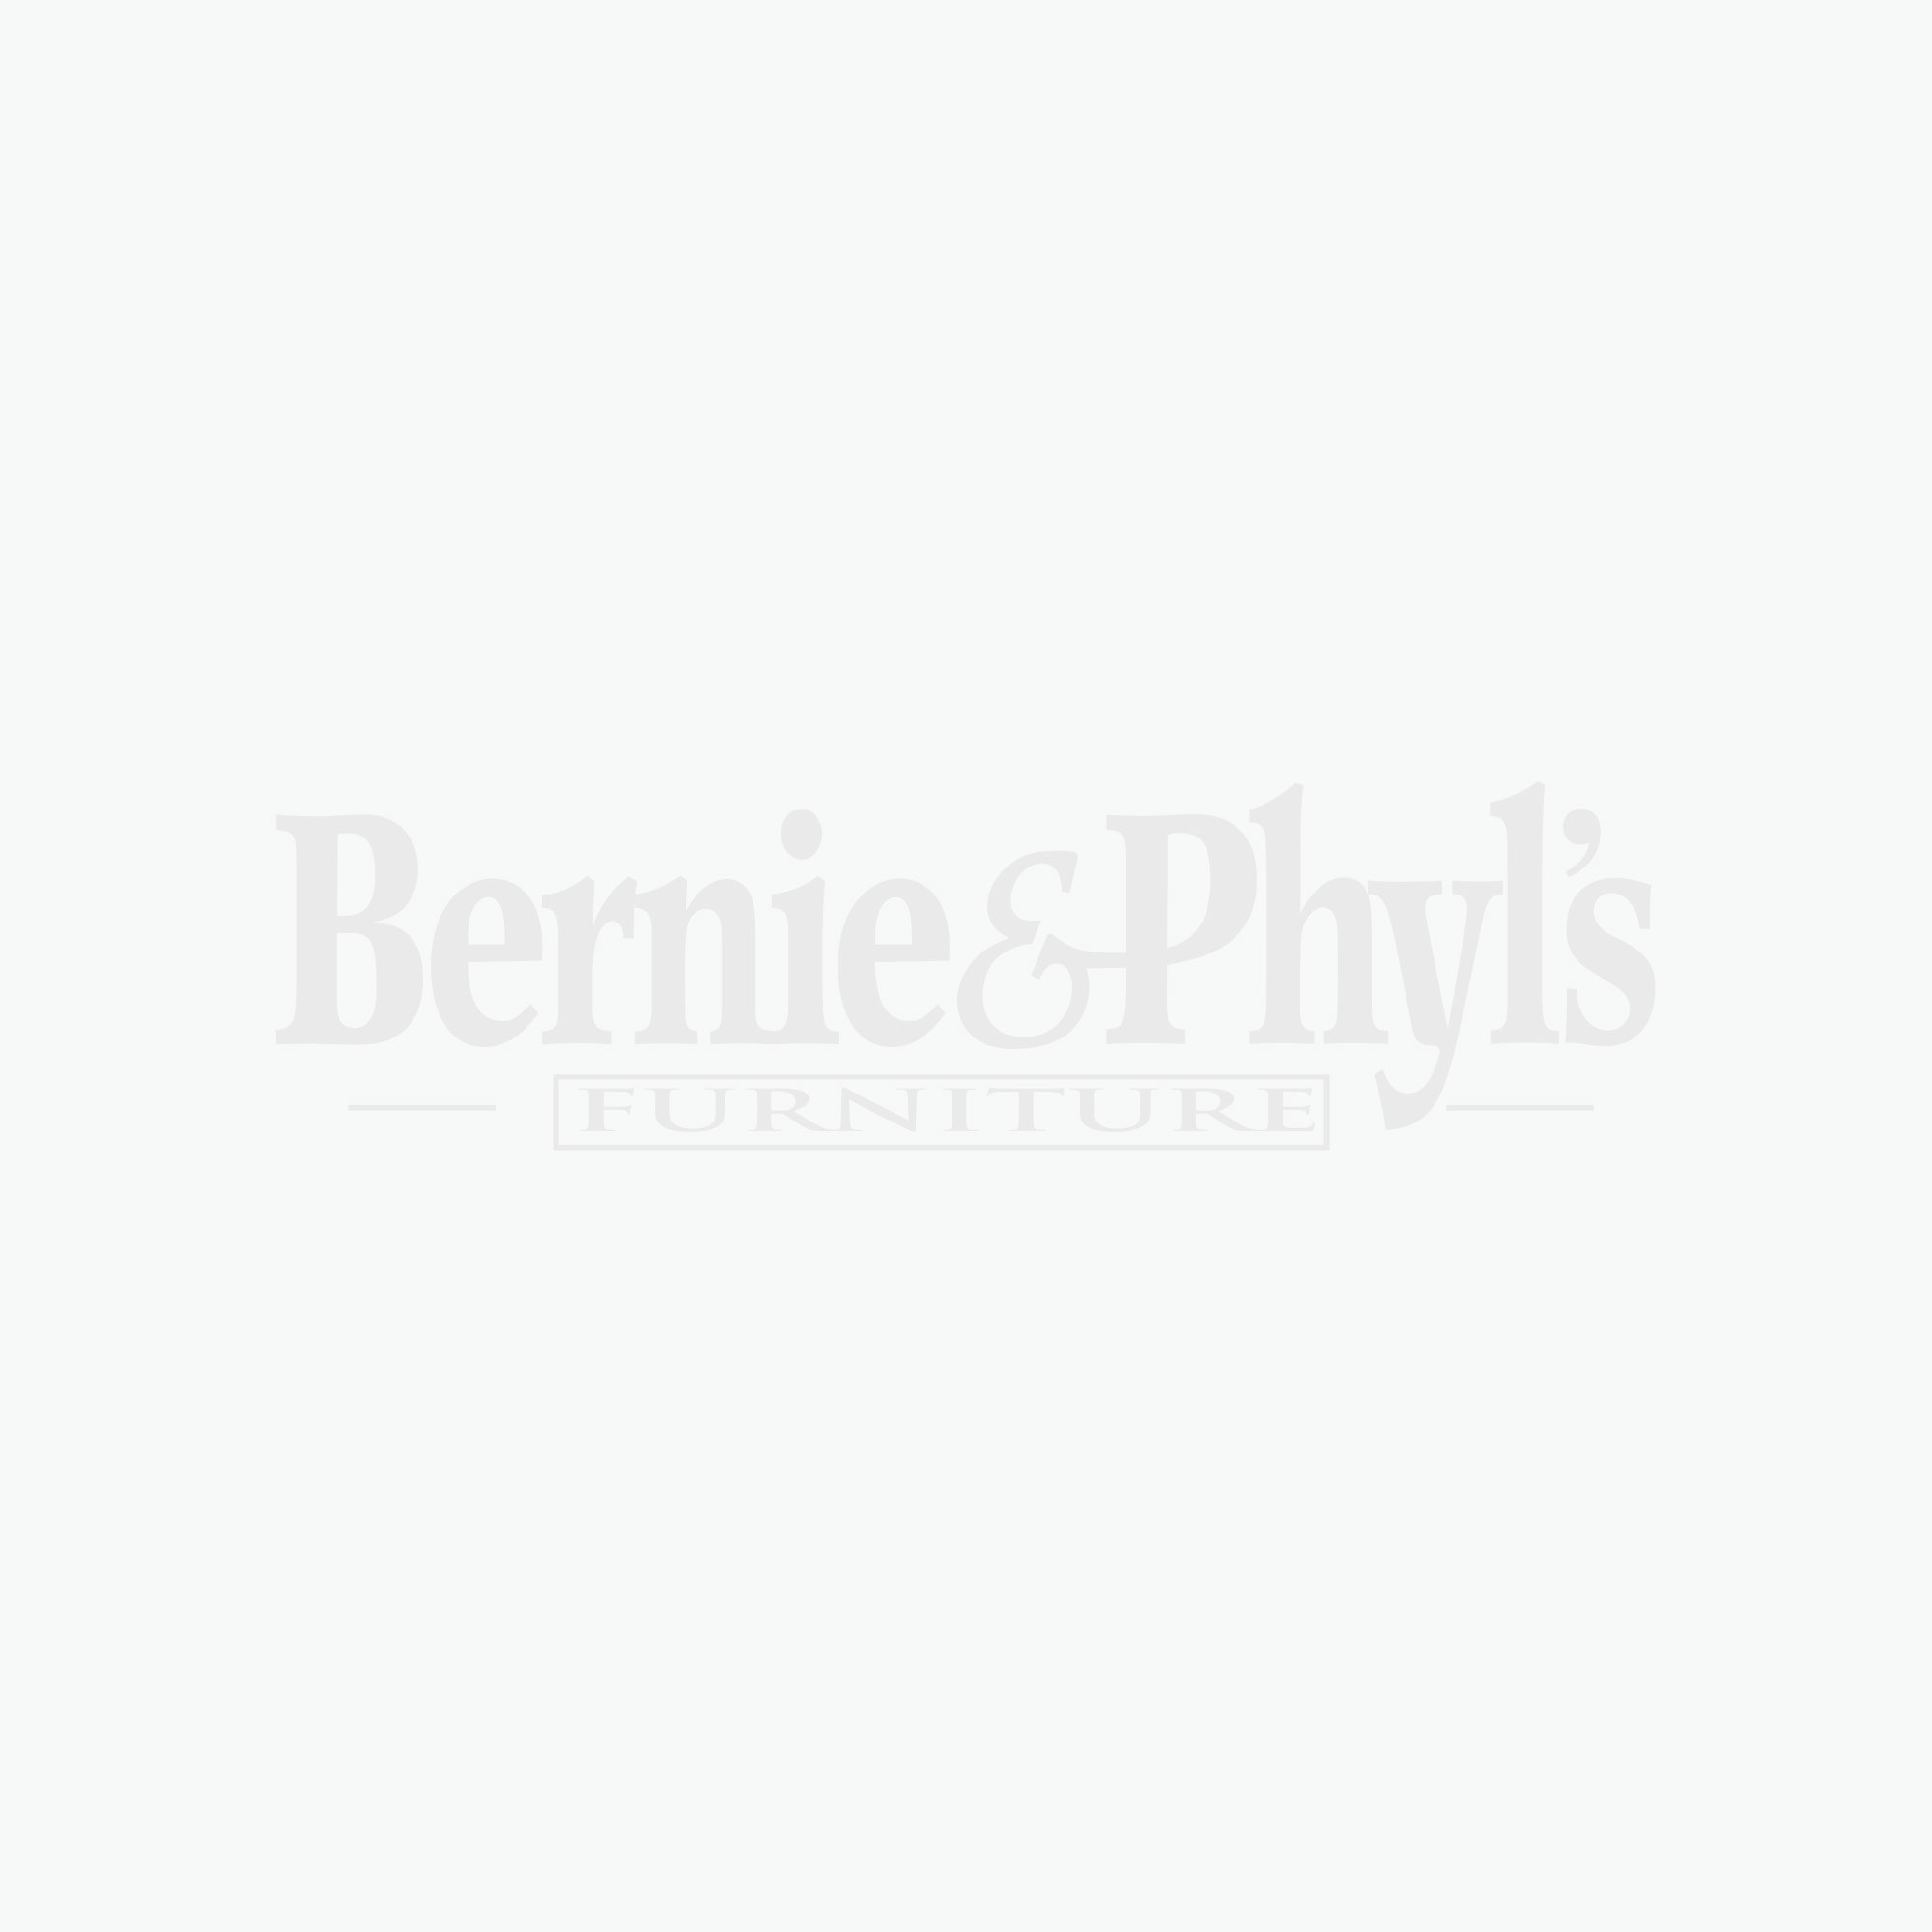 Serta Savant Everfeel Plush  - Queen - Mattress With LP Foundation